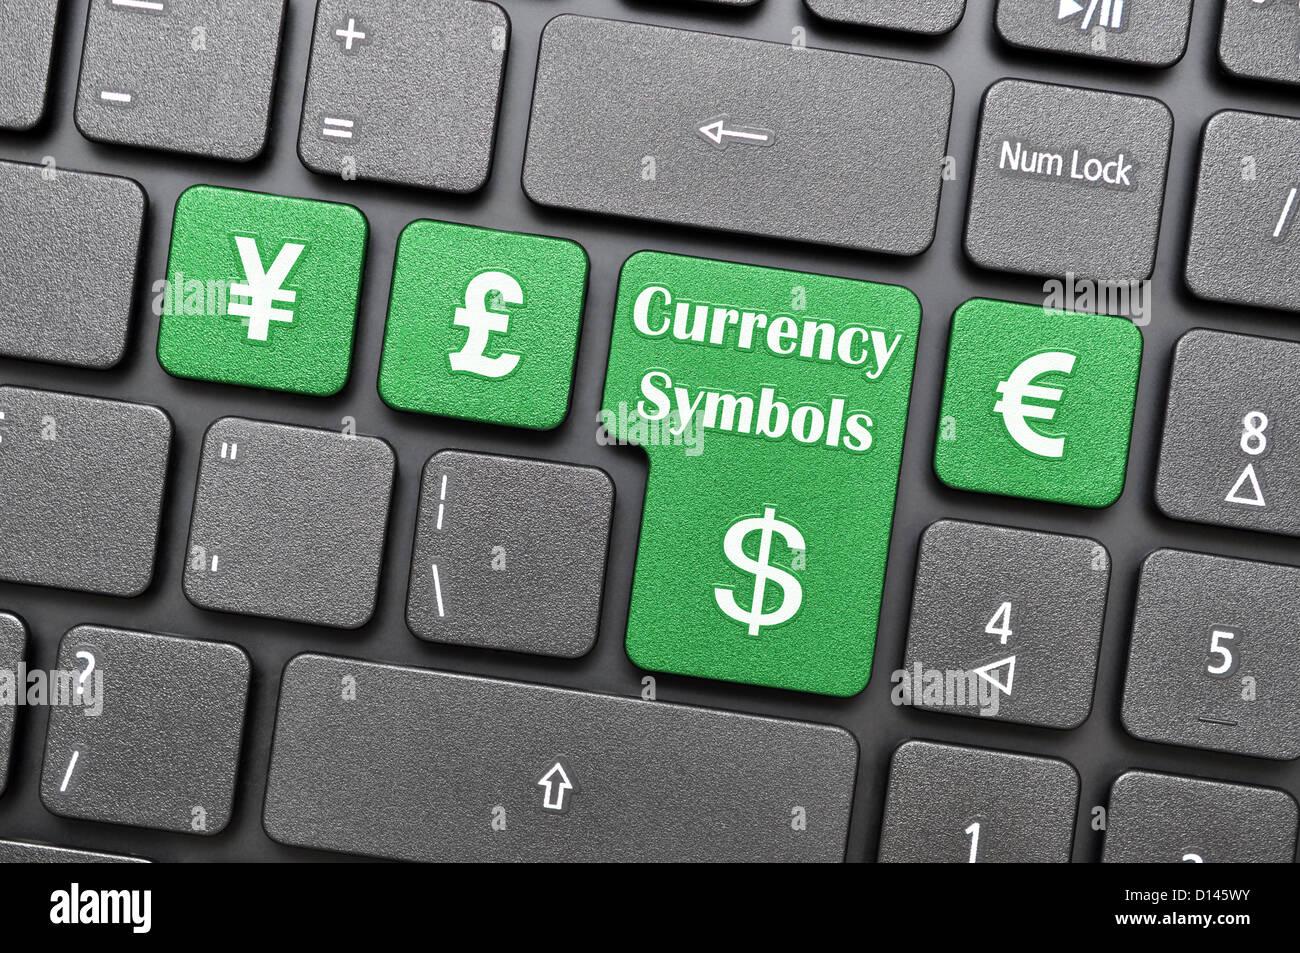 Currency Symbols On Keyboard Stock Photo 52338215 Alamy